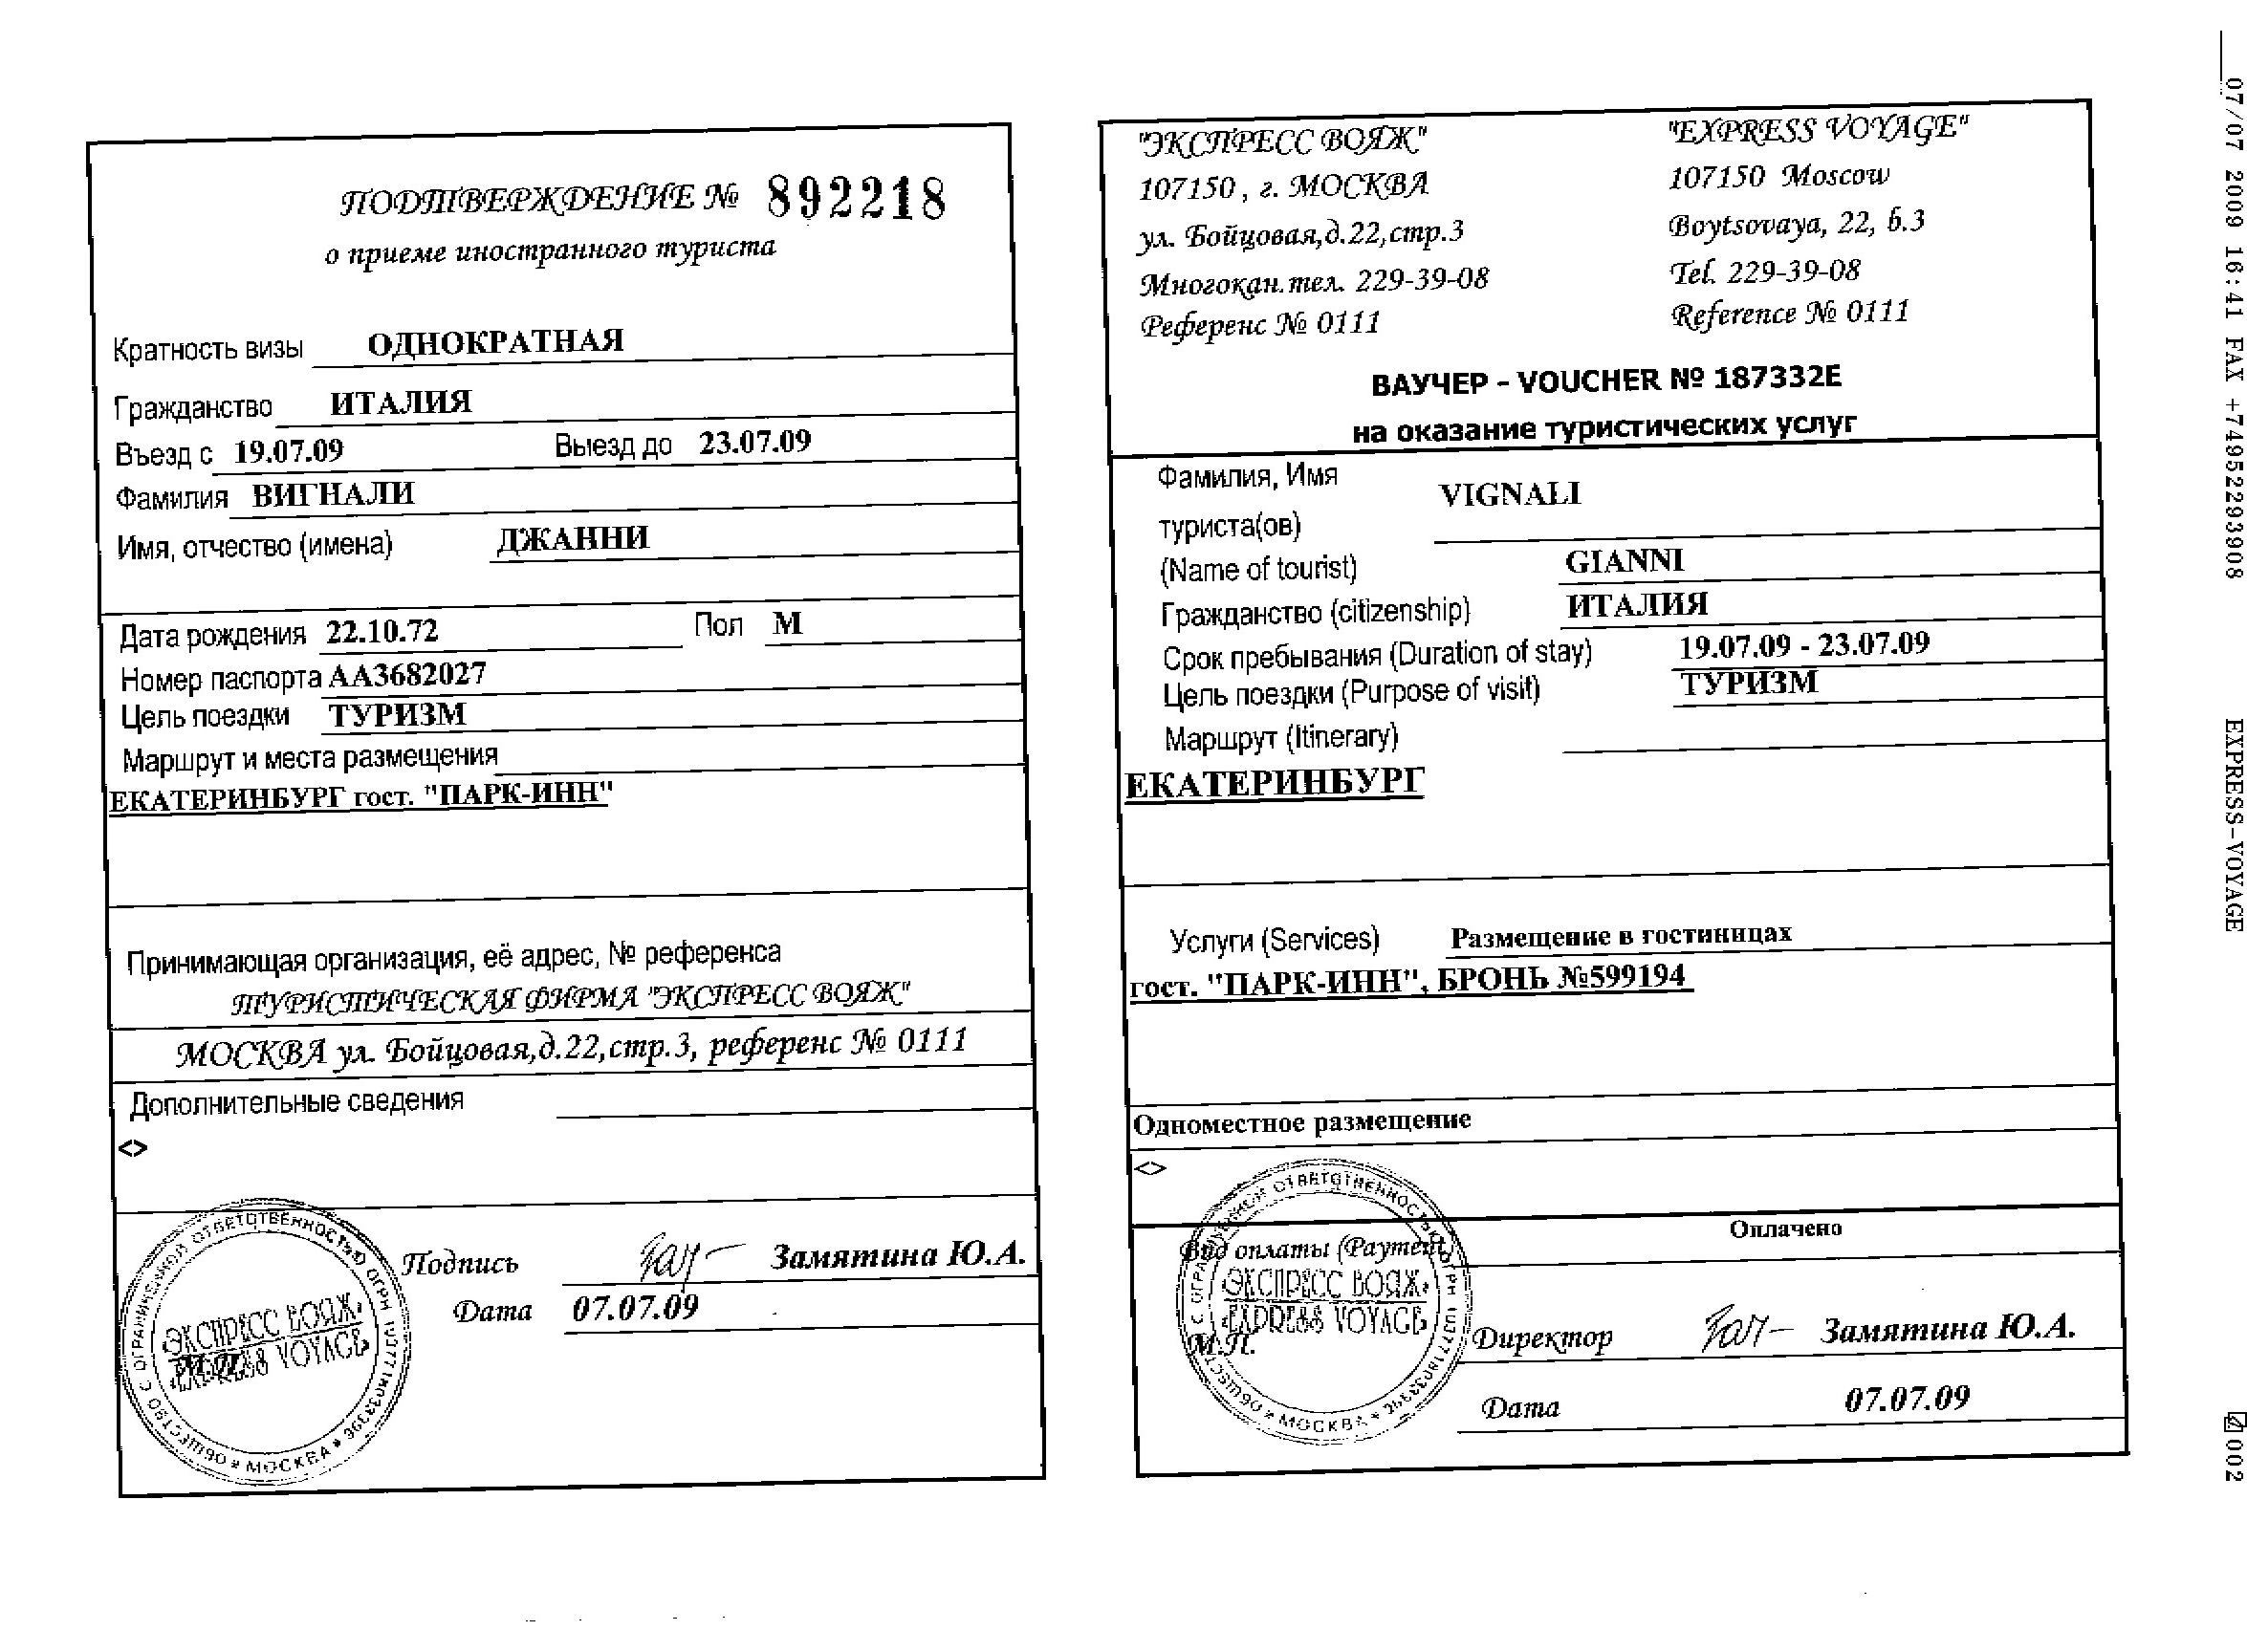 russian visa support invitation letter to russia in